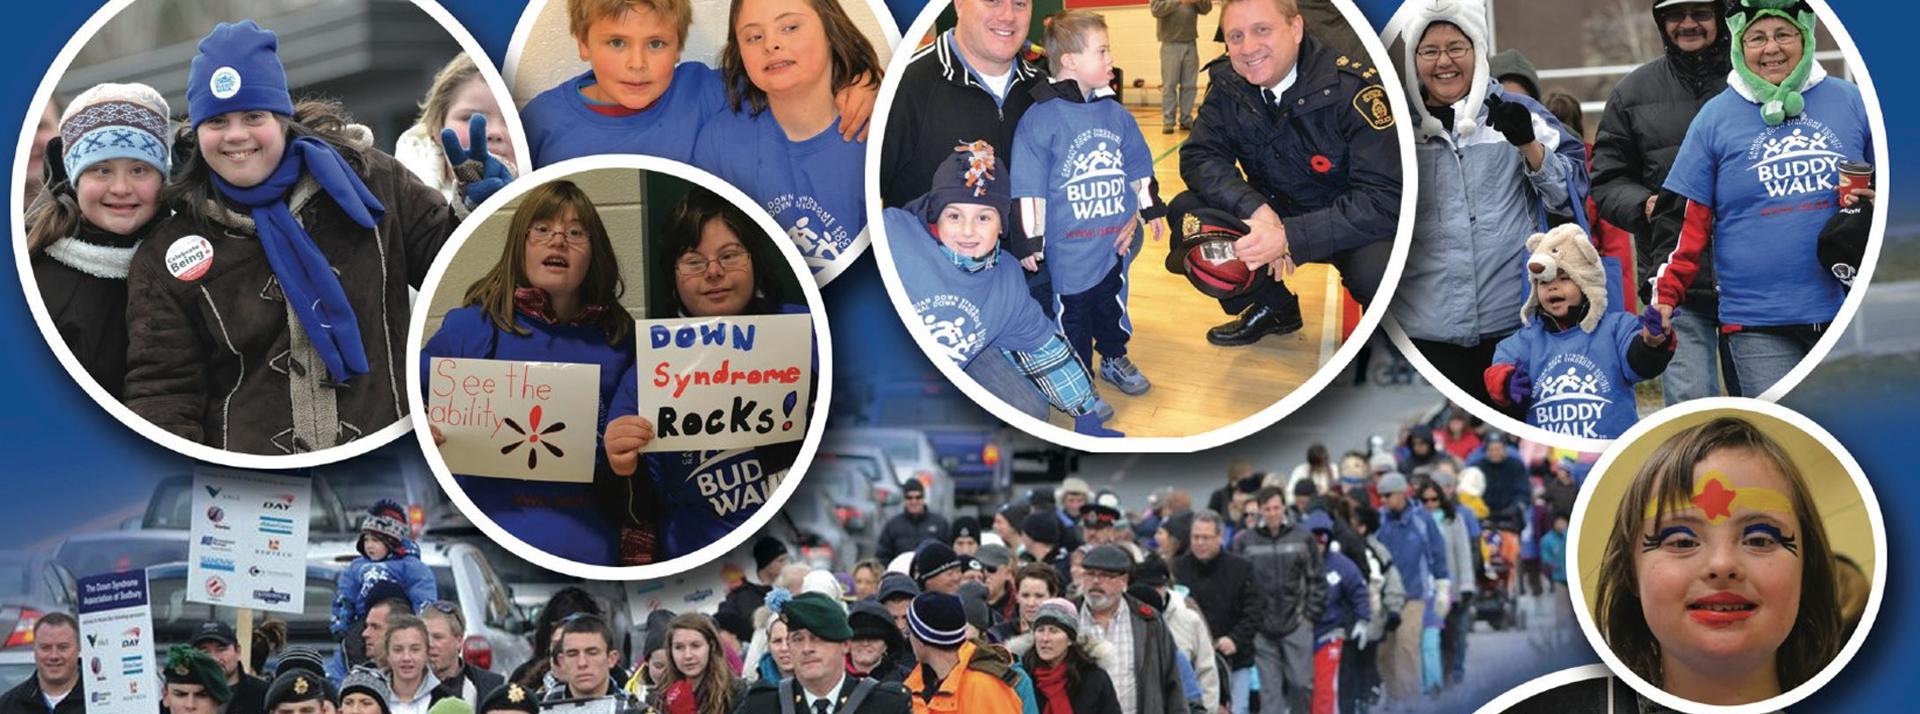 Go21 Sudbury Walk for Down Syndrome Awareness